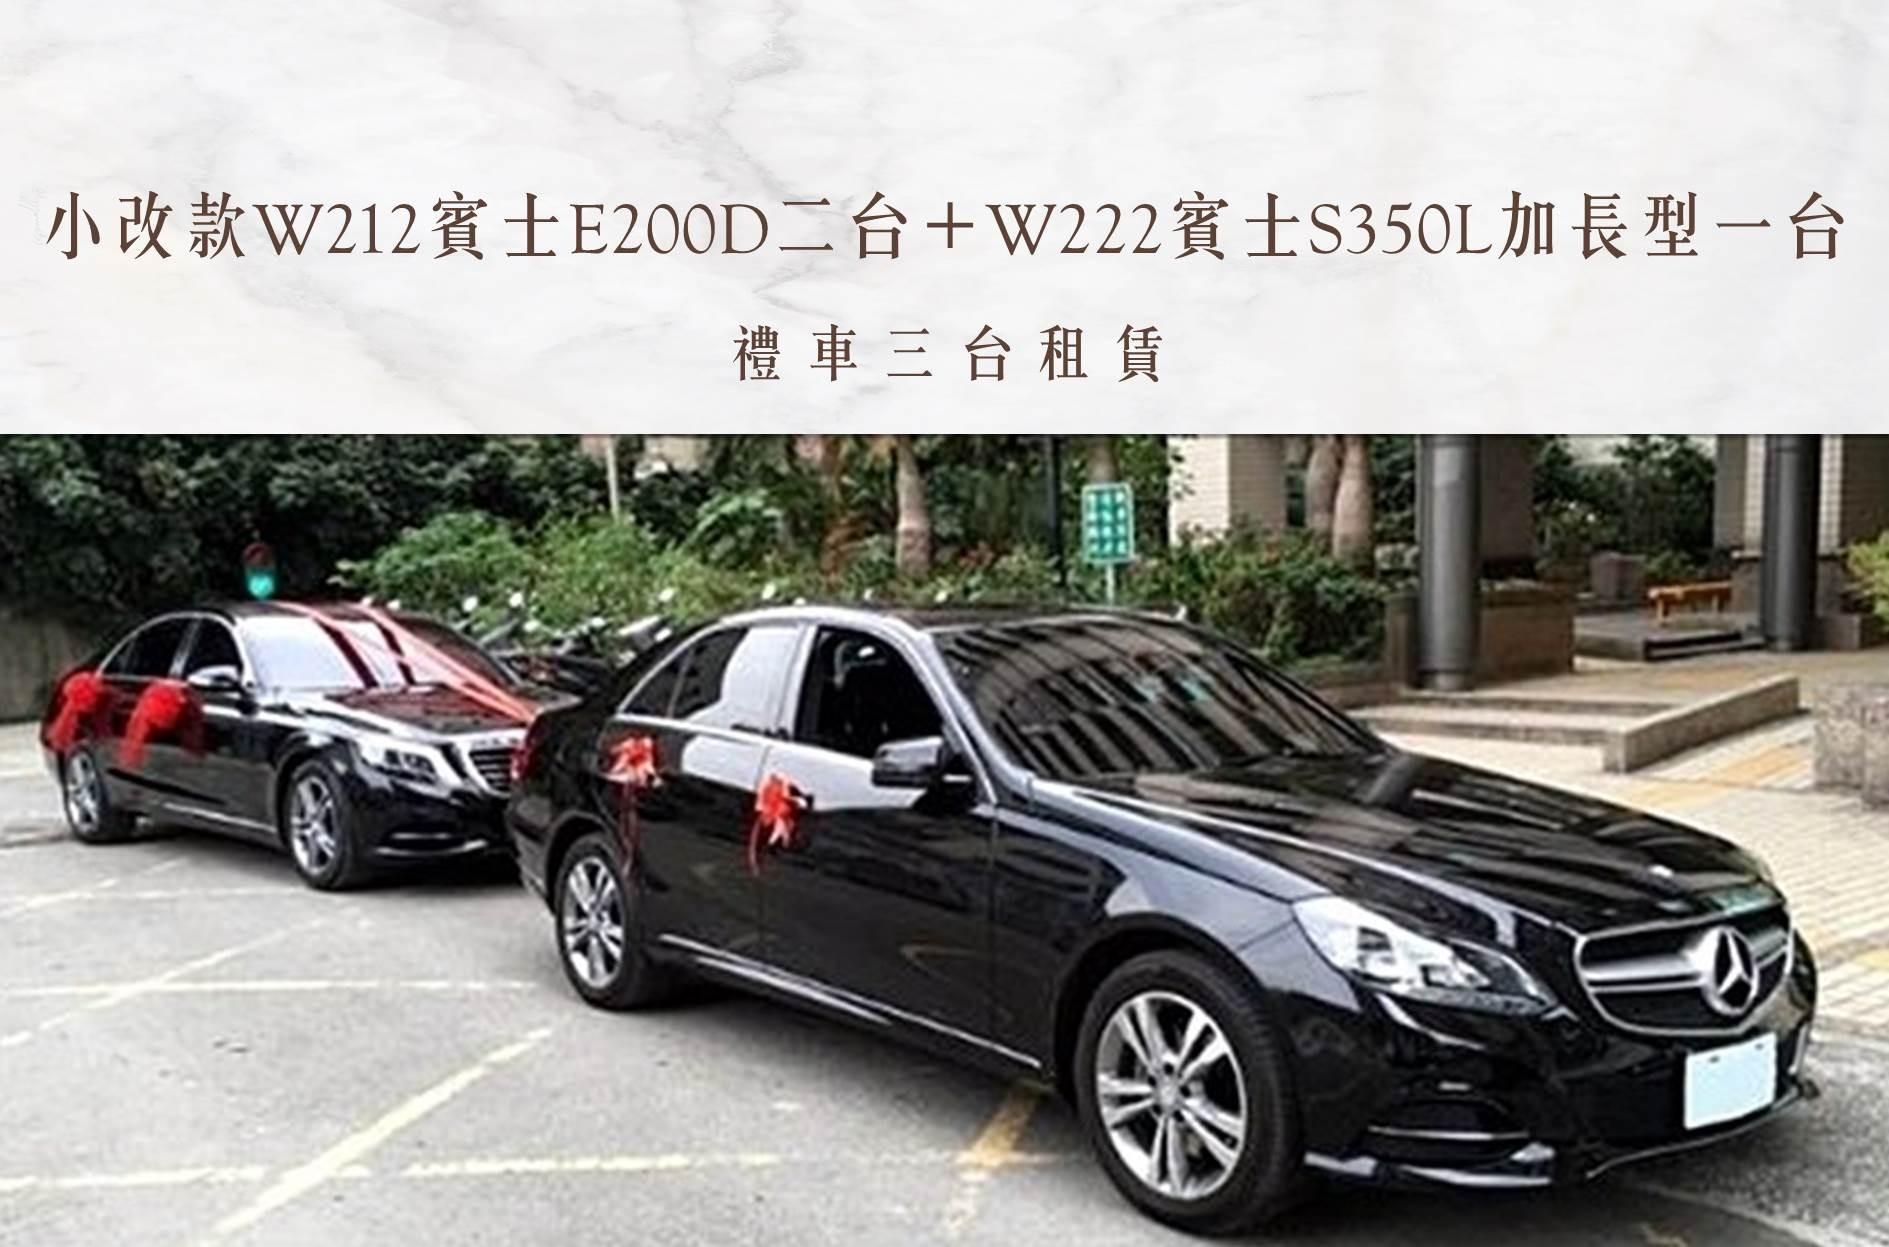 小改款W212賓士E200D二台+W222賓士S350L加長型一台